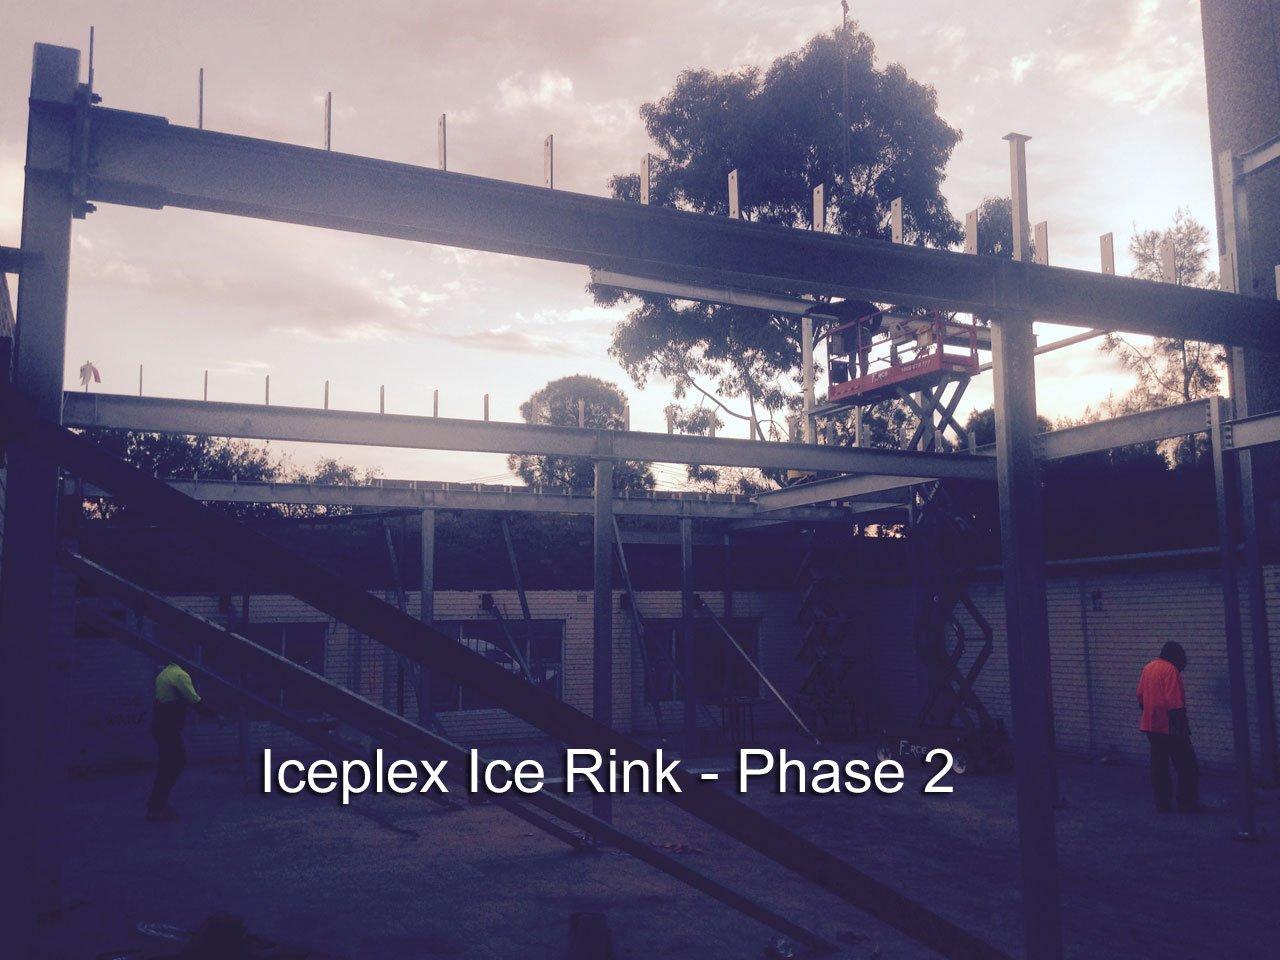 Iceplex-Phase-2-c